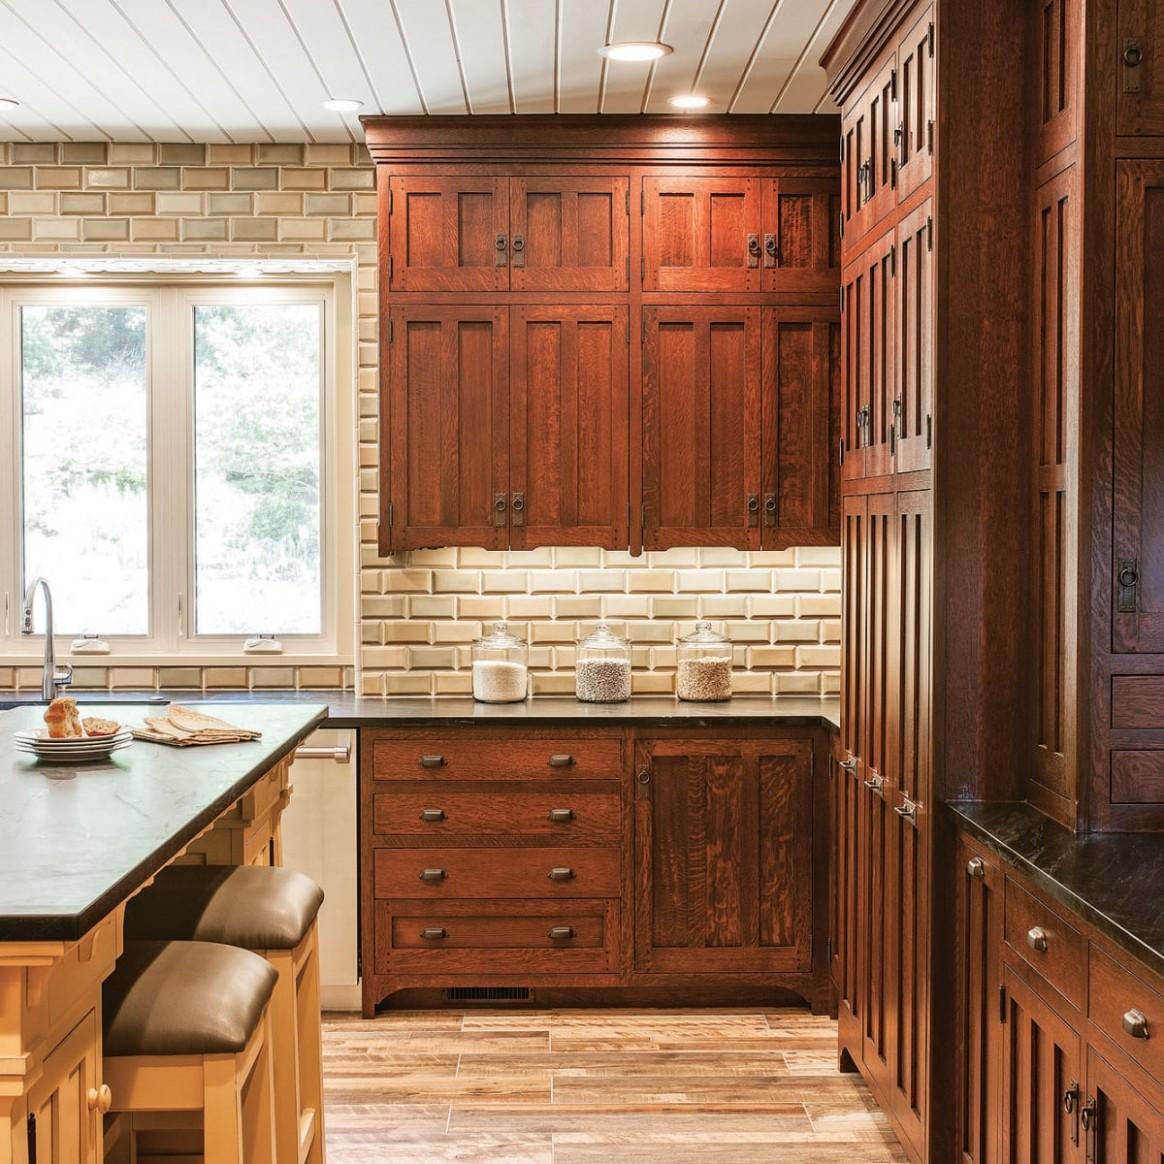 Classic Cabinets - Period Homes - Bath Maine Kitchen Cabinets